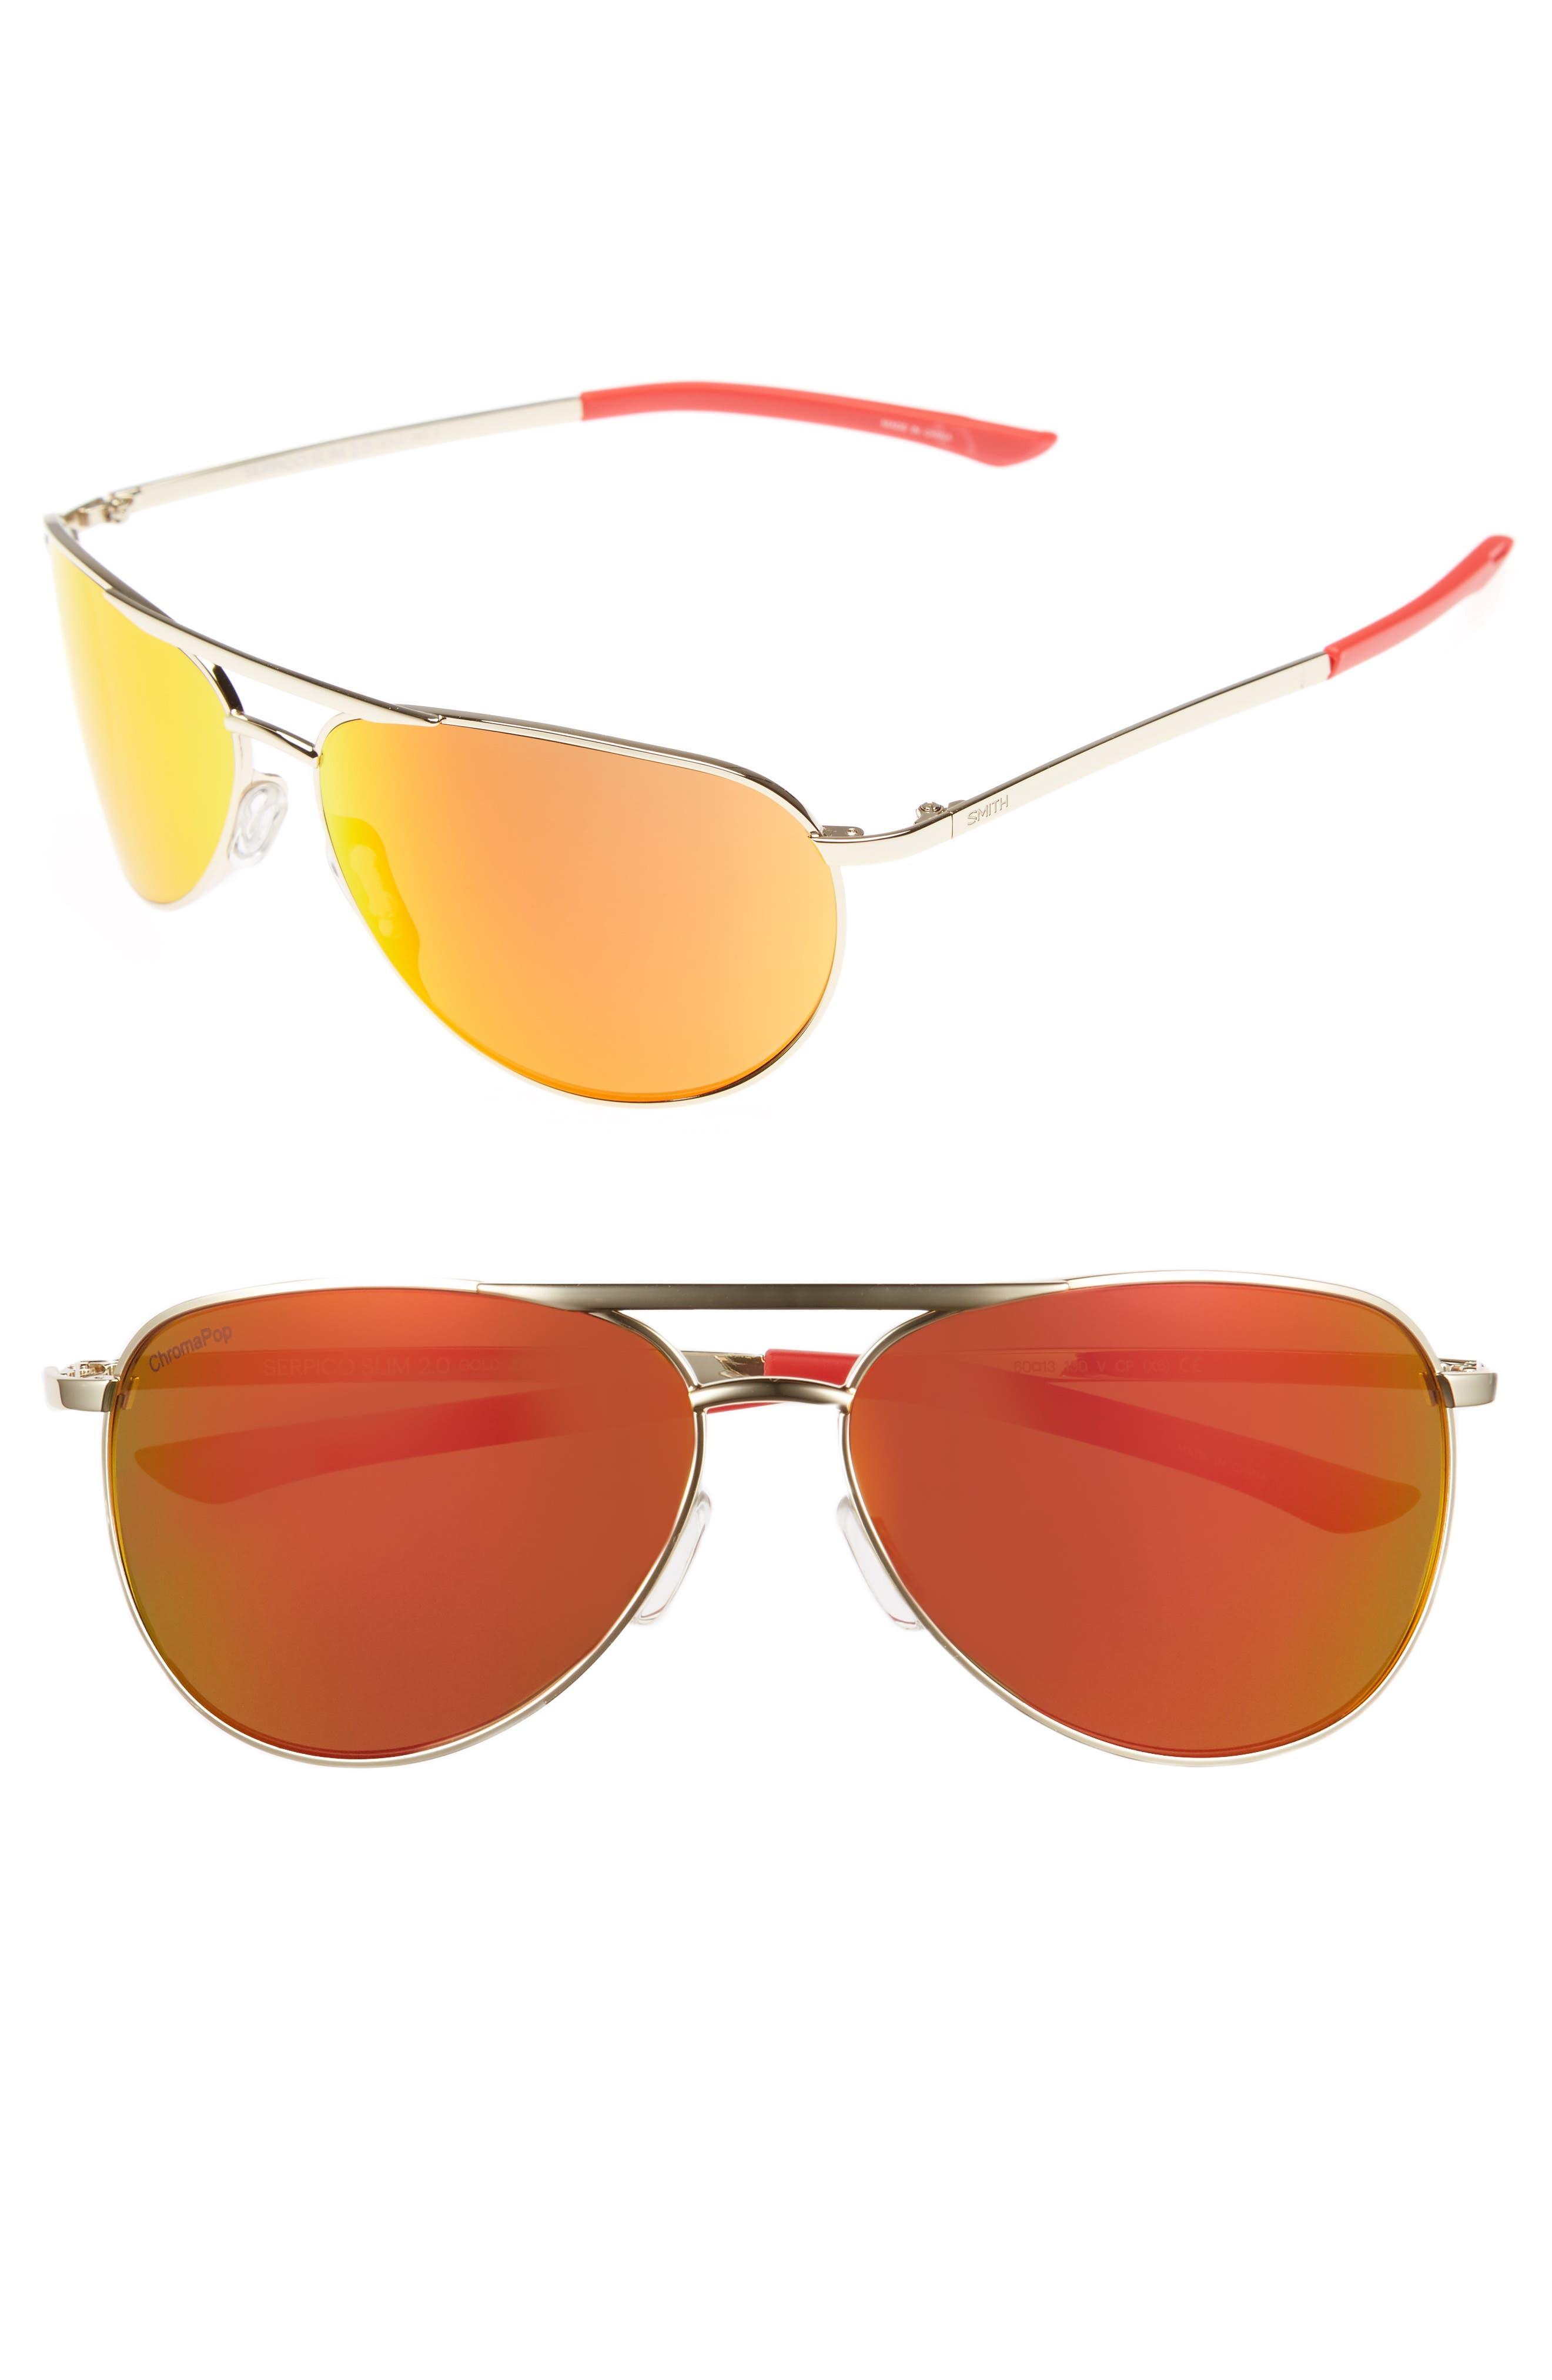 Alternate Image 1 Selected - Smith Serpico Slim 2.0 60mm ChromaPop Polarized Aviator Sunglasses